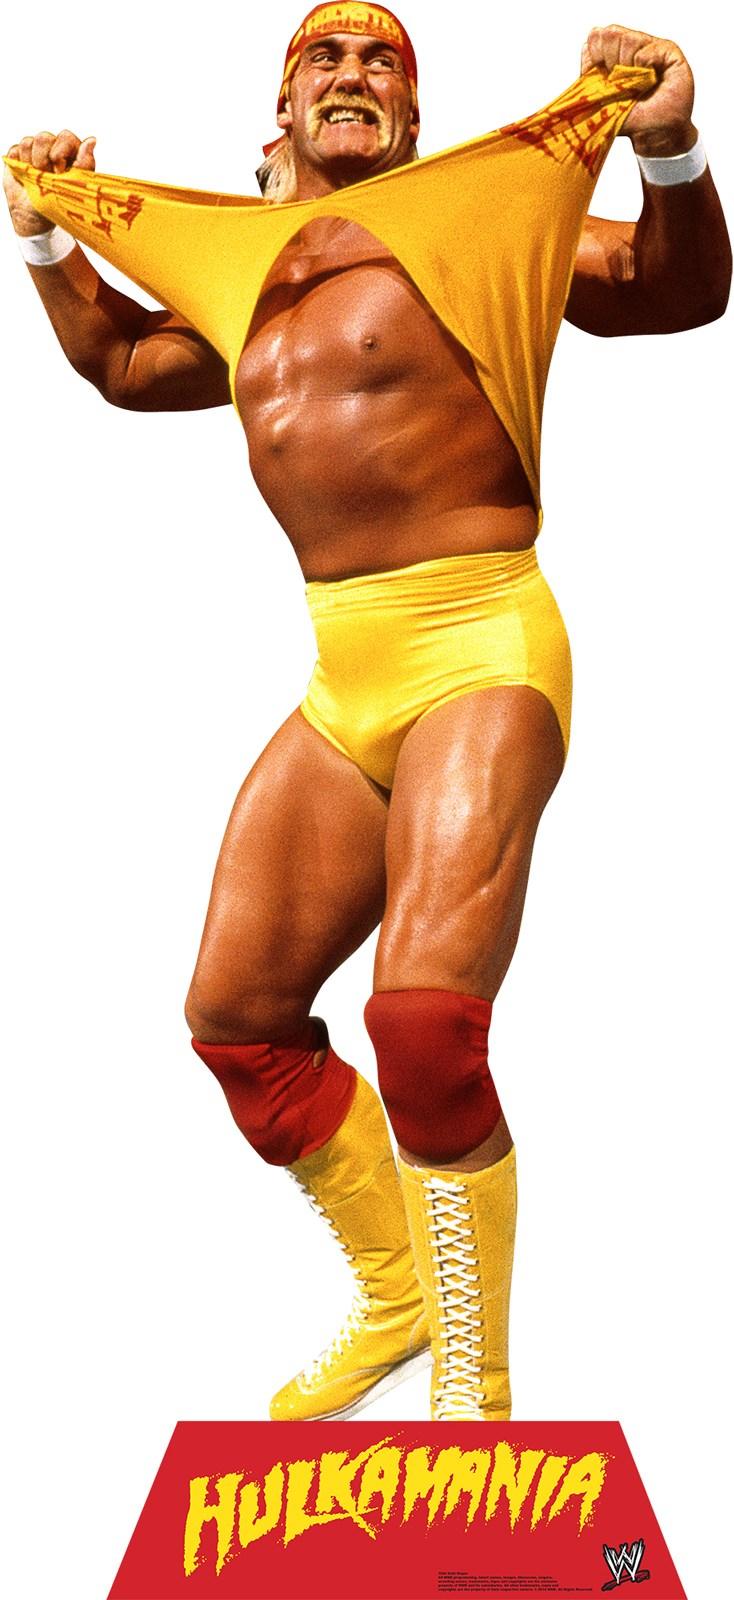 Image of WWE Party - Hulk Hogan Standup